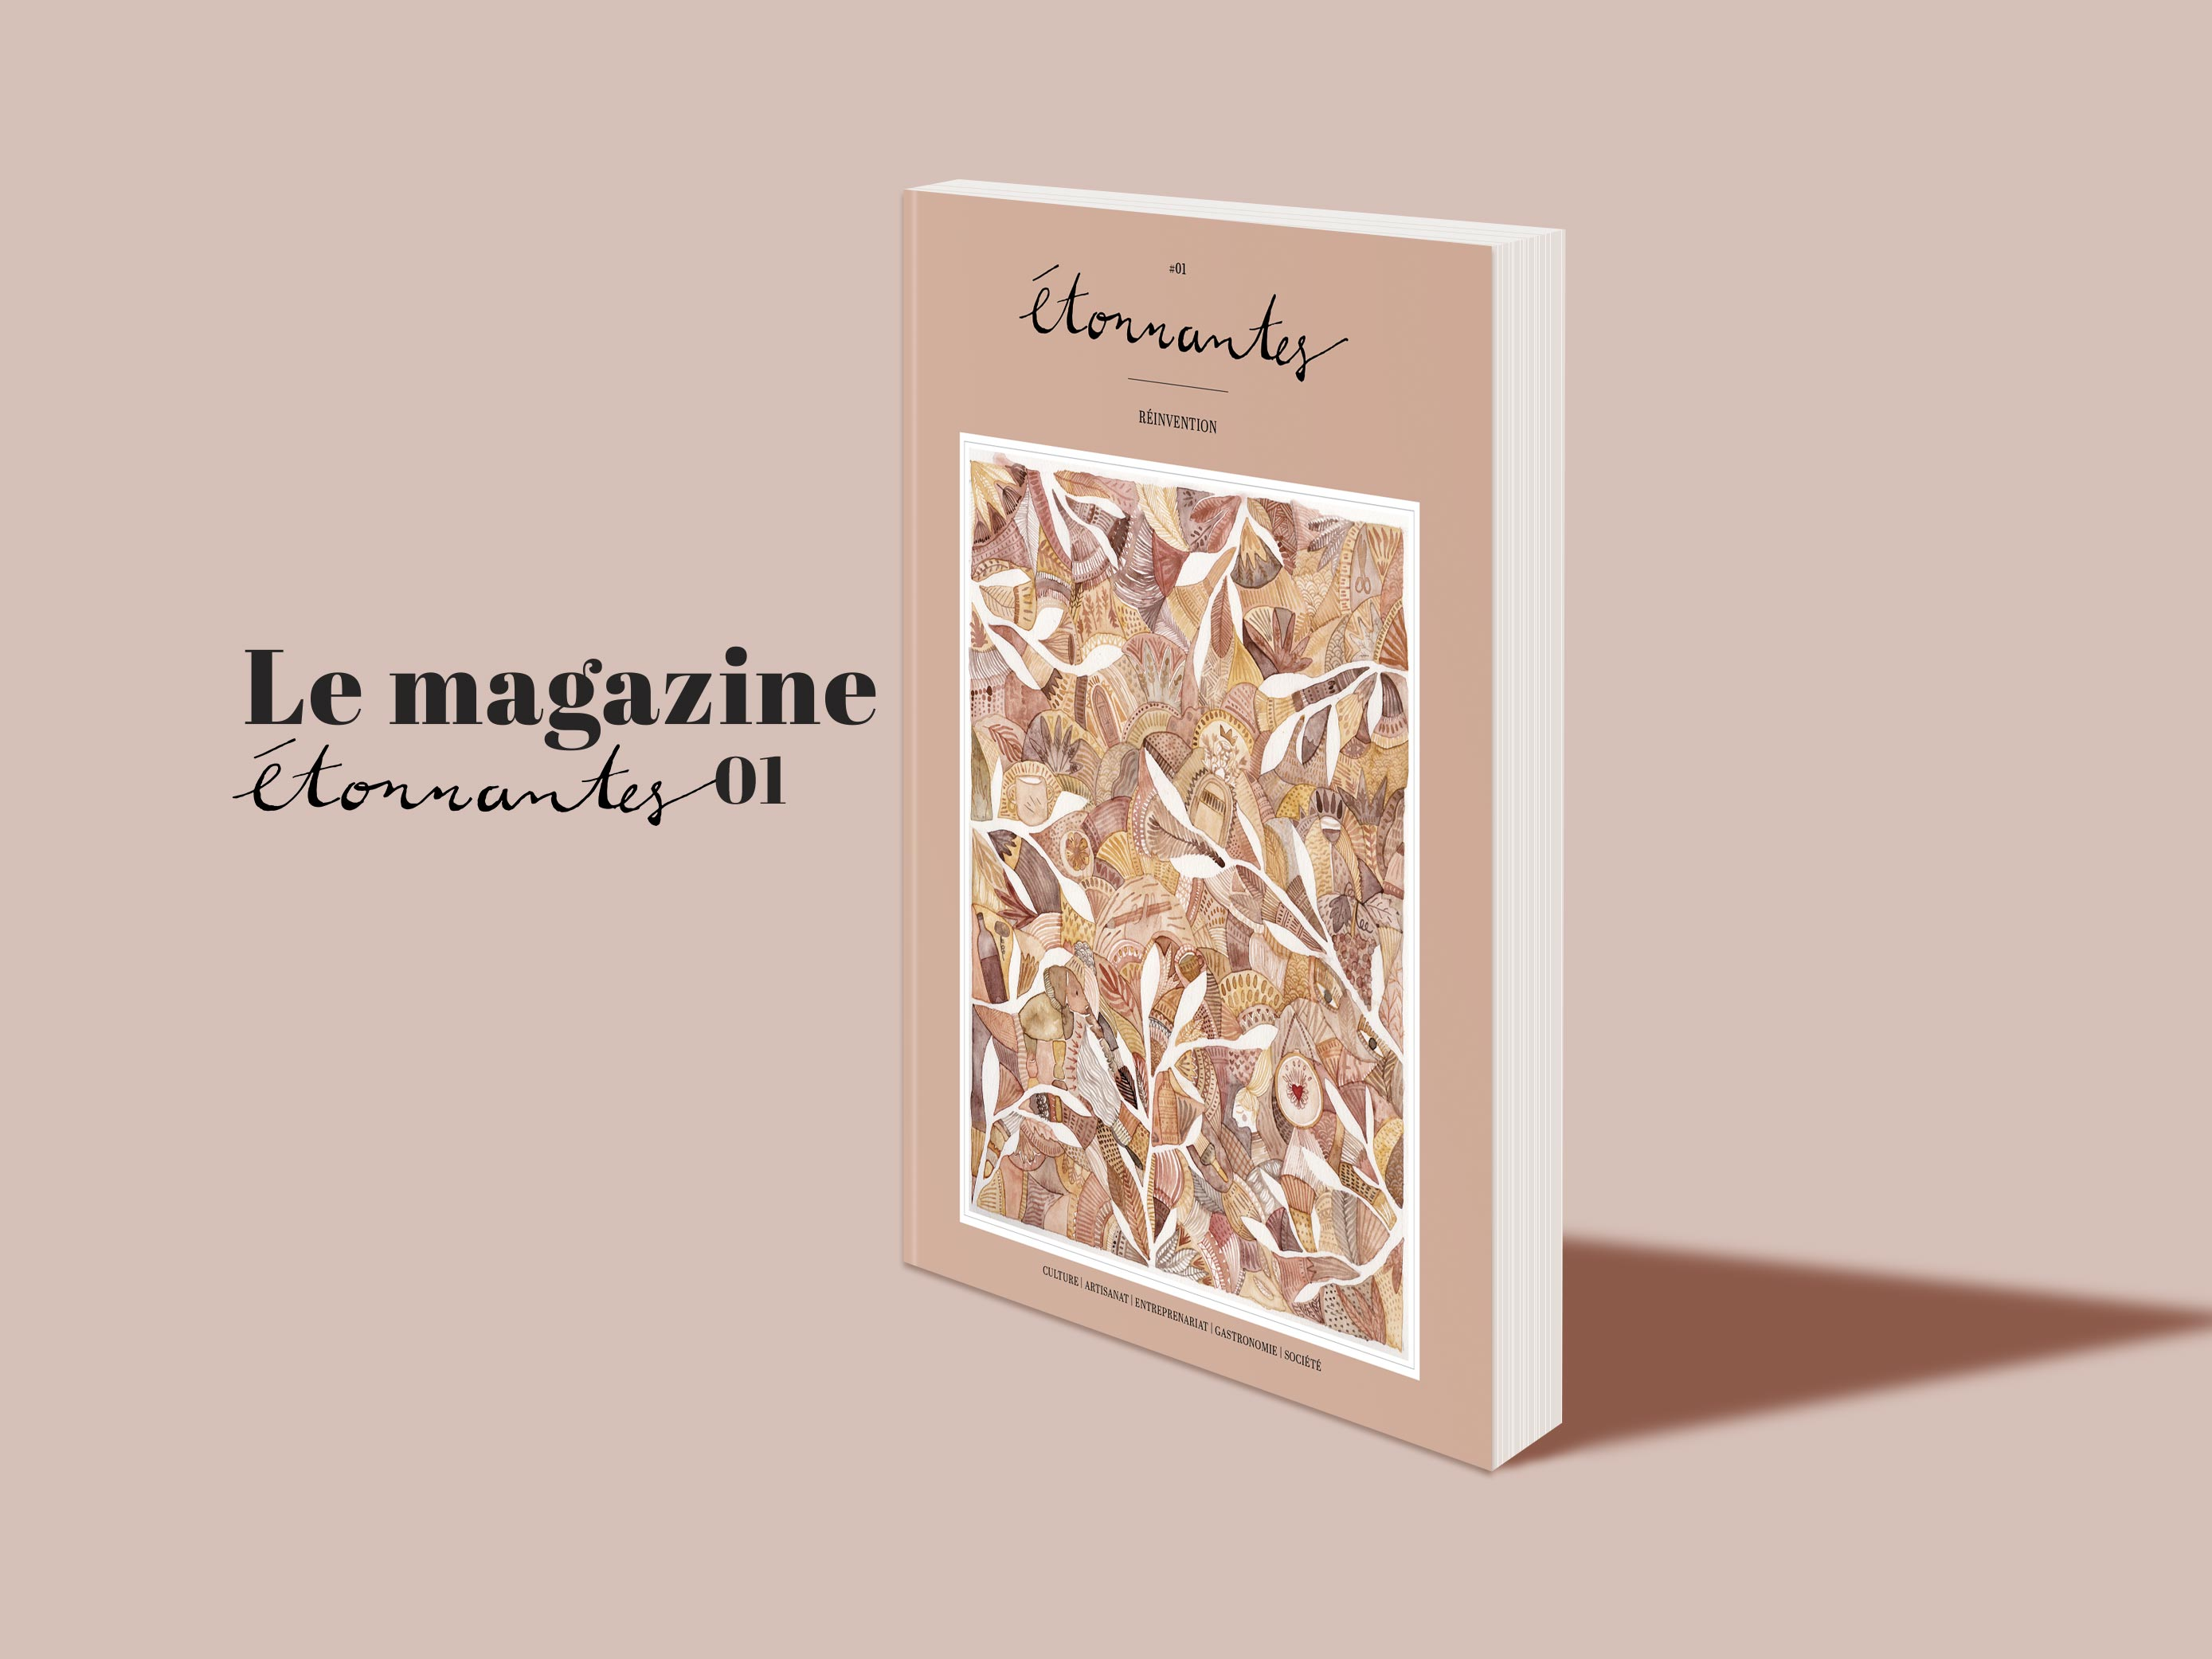 etonnantes-magazine-papier-revue-projet-crowdfunding-solennlarnicol-couverture-illustration